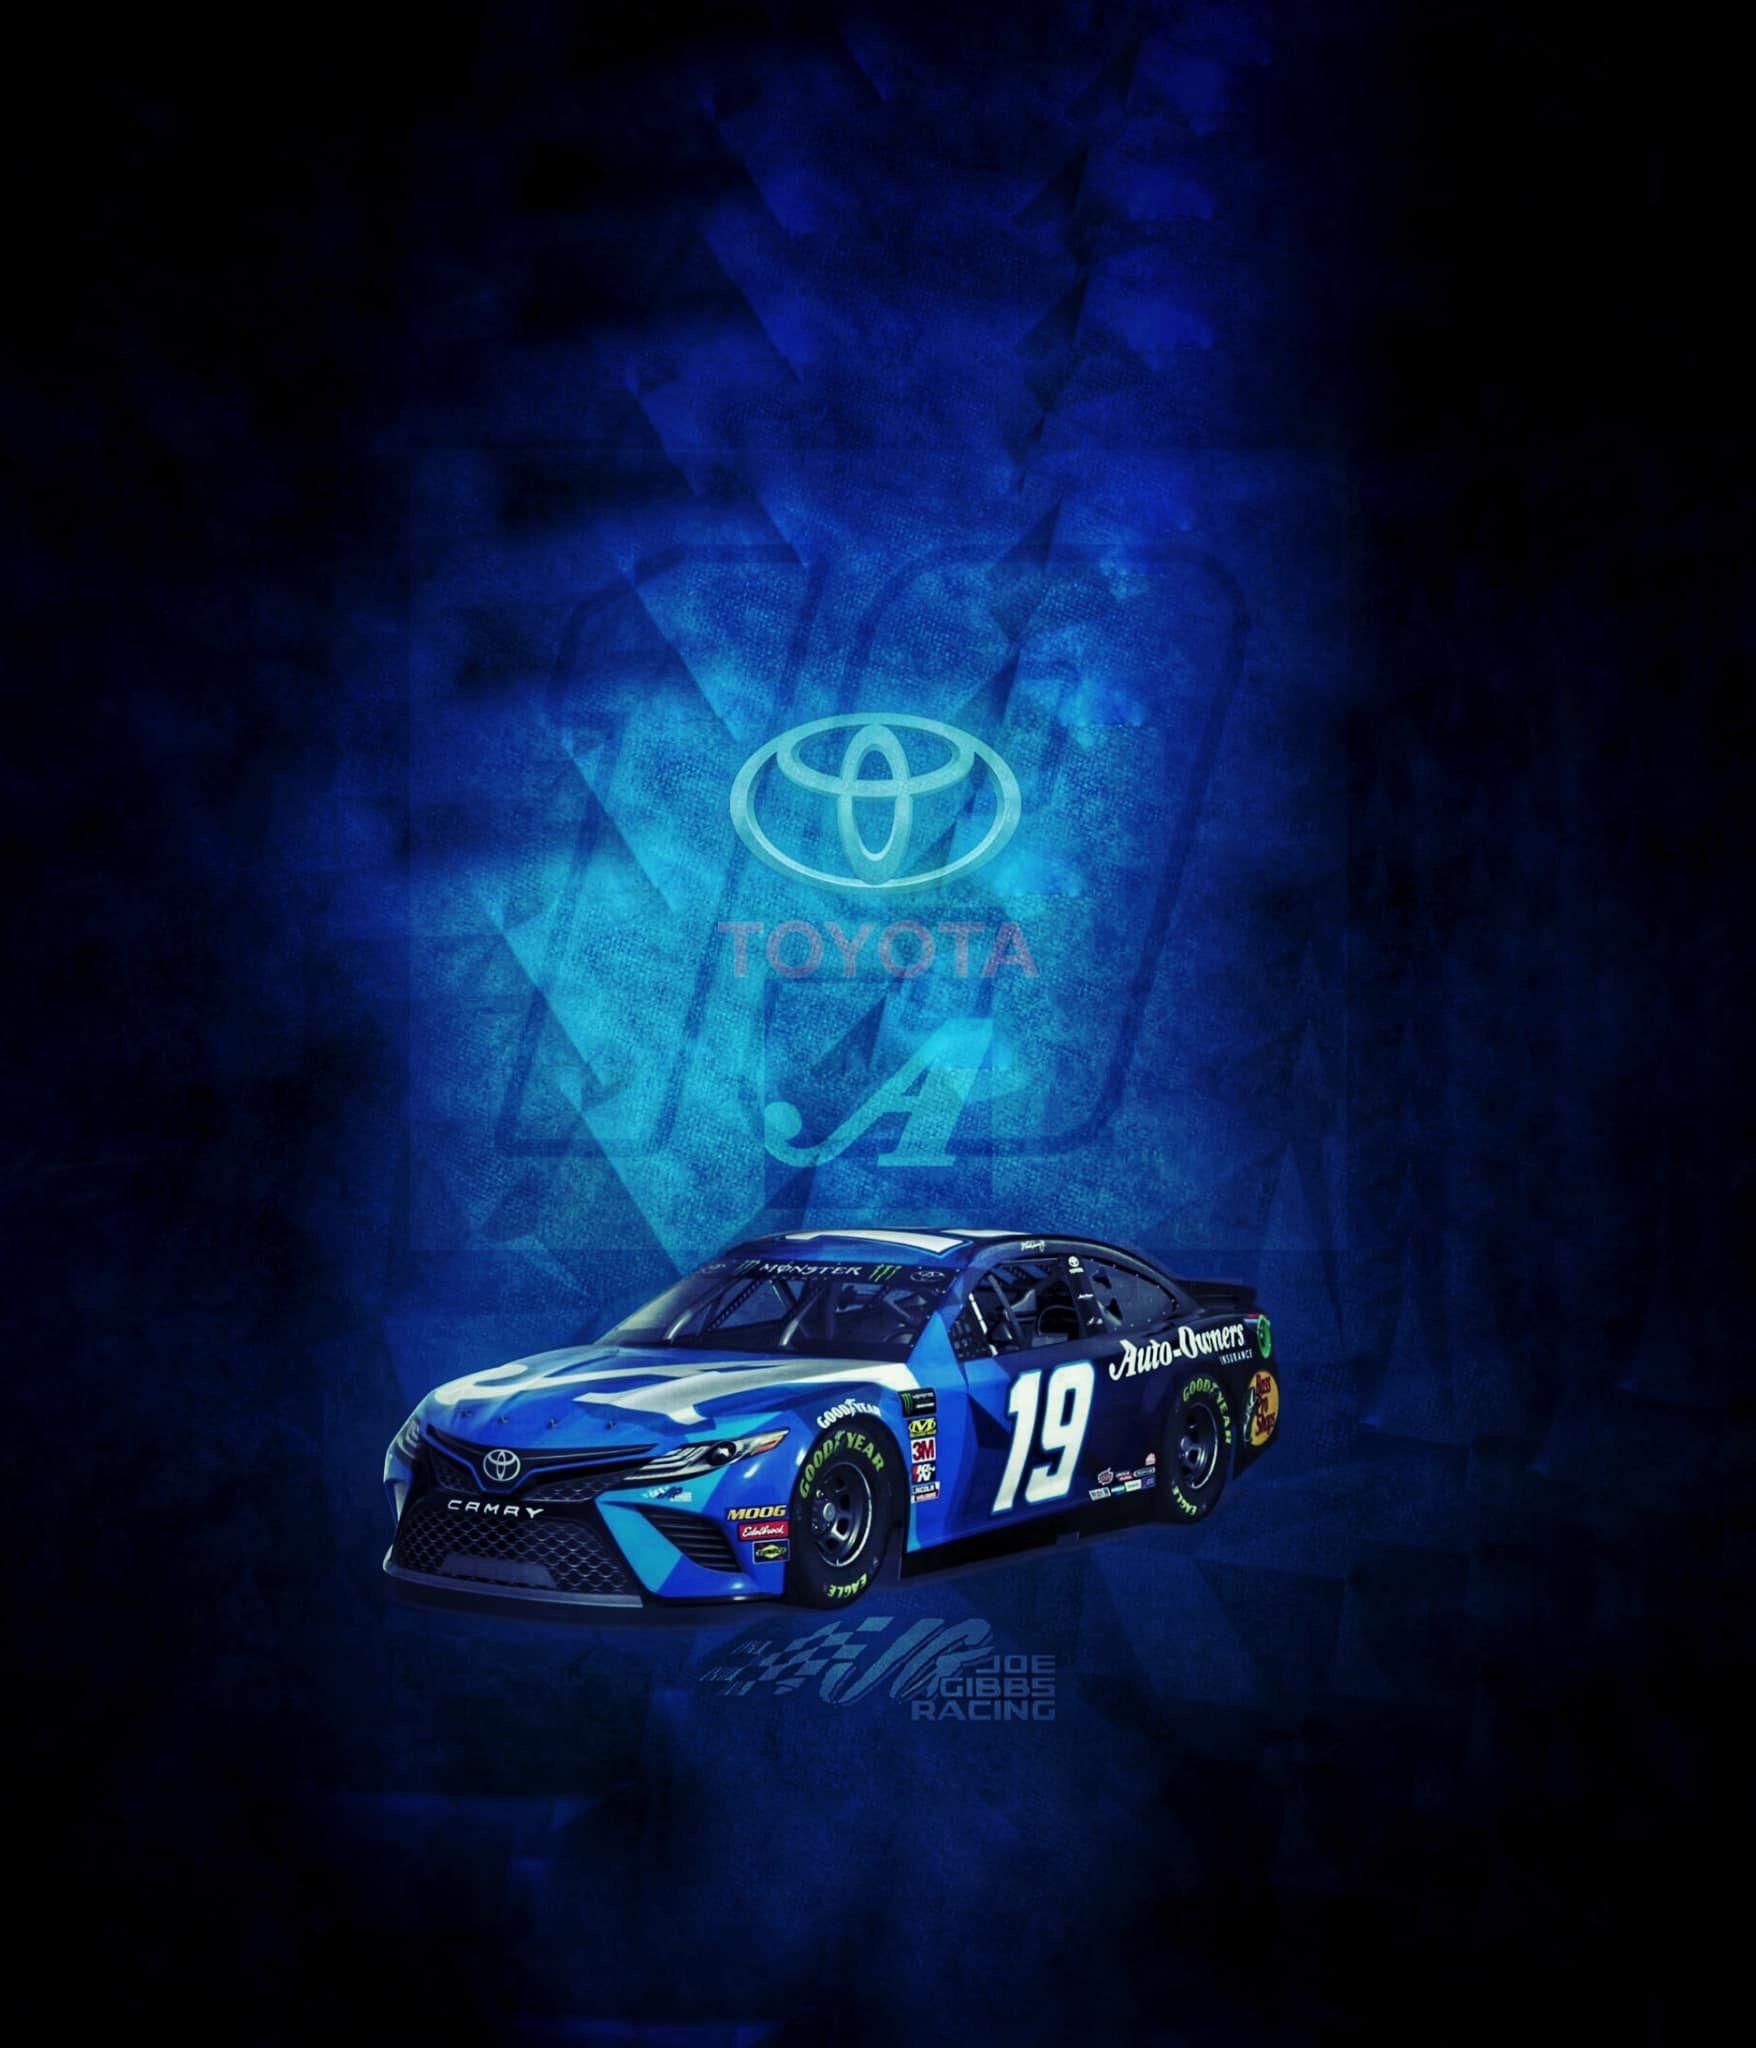 Truex Jr 19 Wallpaper By Jonathan Ray Click On 3 Dots Above Photo To Download Truex Jr Martin Truex Jr Nascar Race Cars